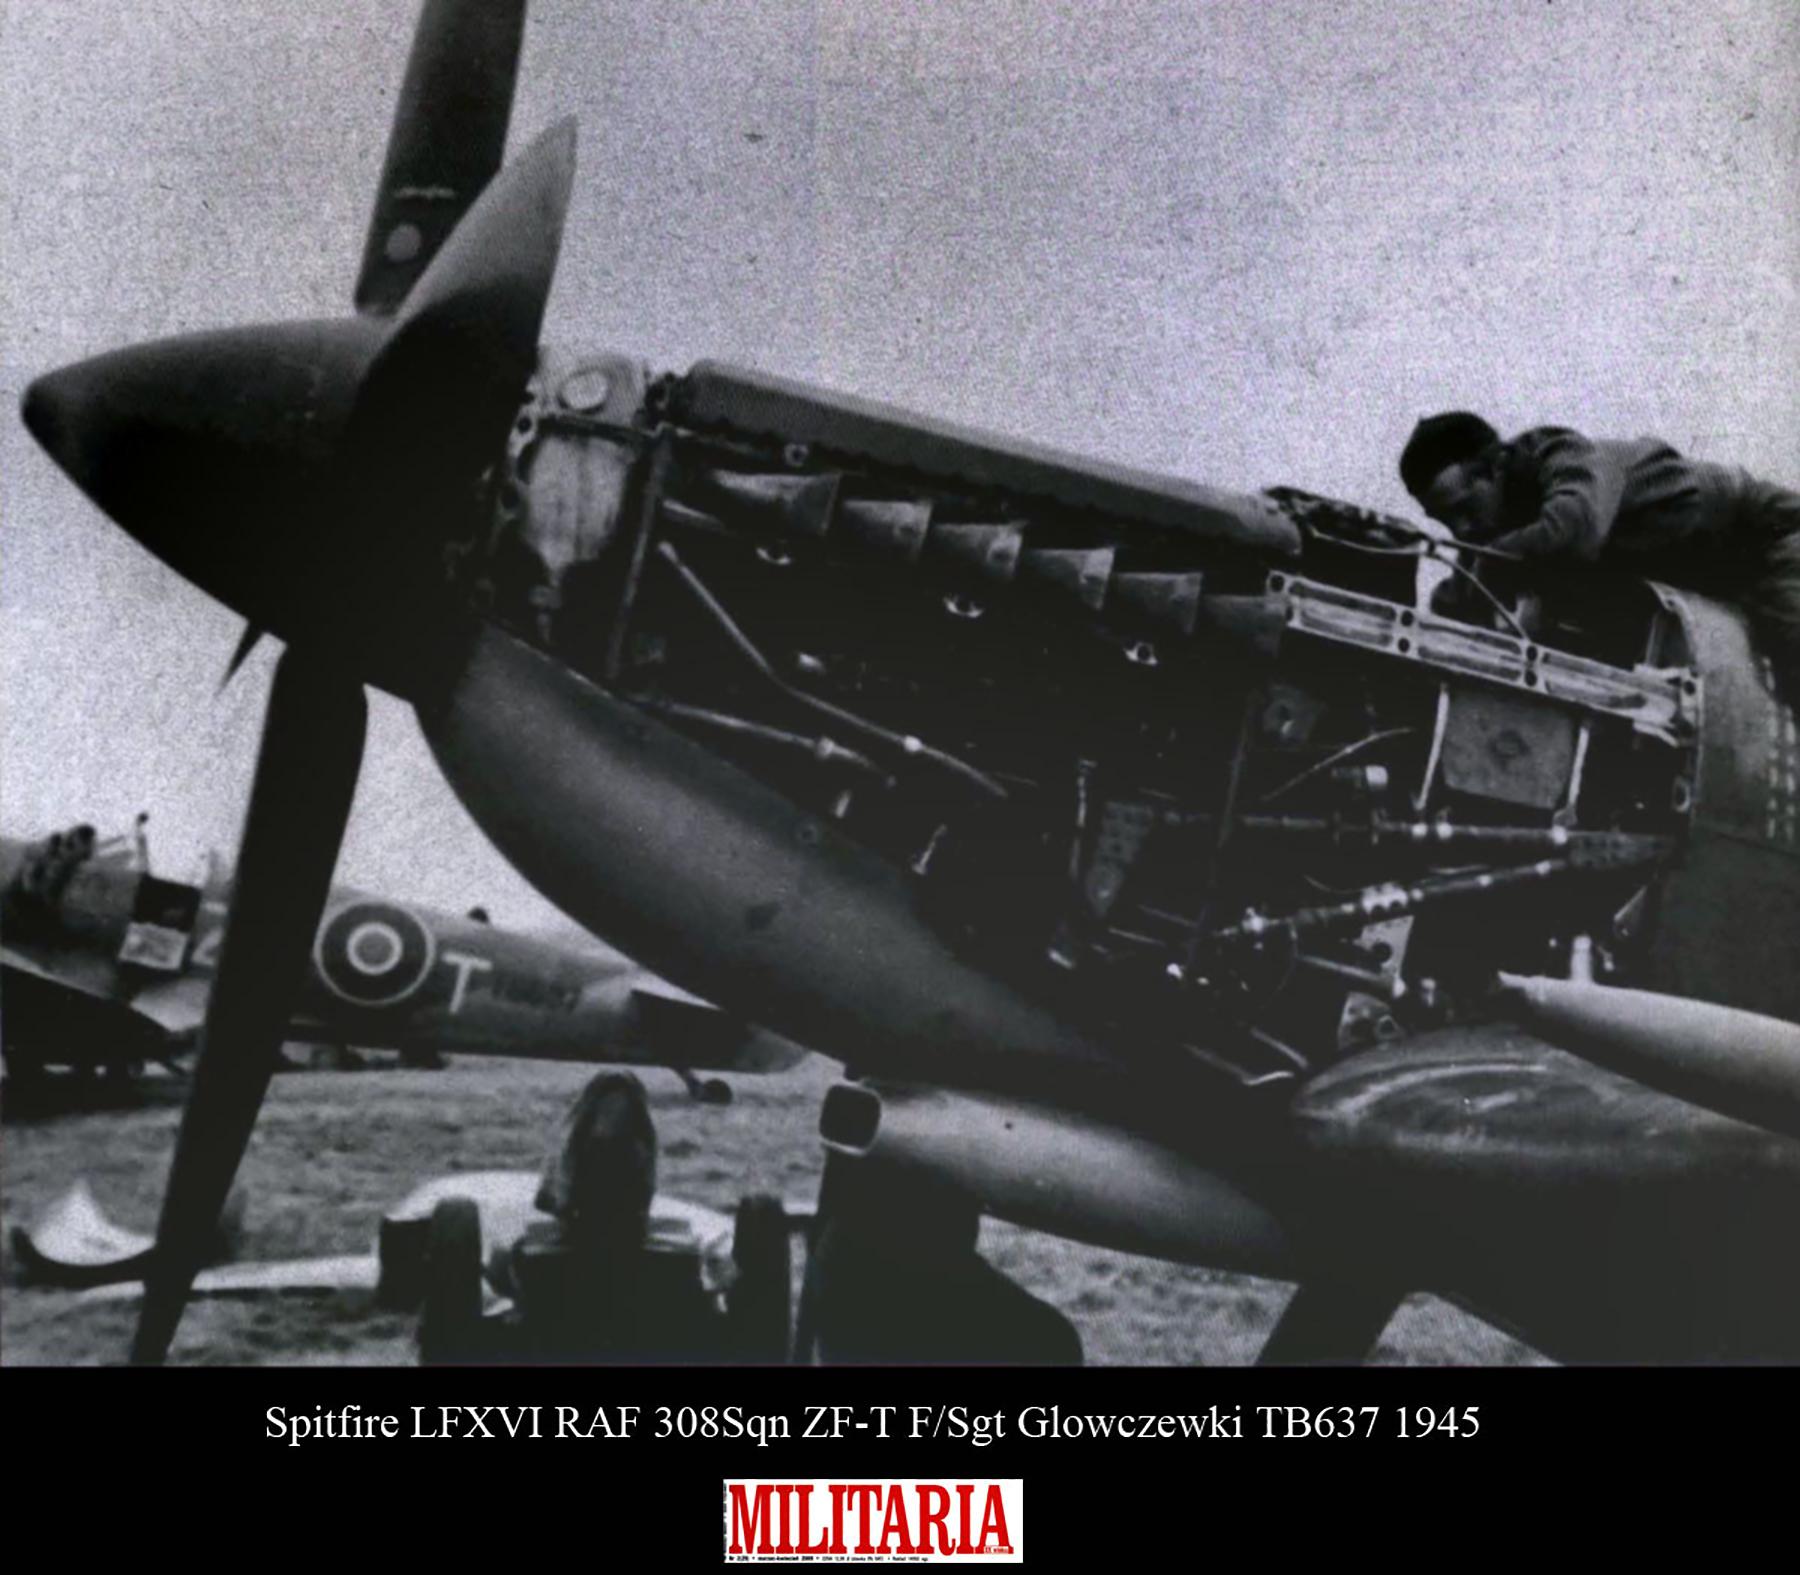 Spitfire LFXVI RAF 308Sqn ZFT F.Sgt Glowczewki TB637 1945